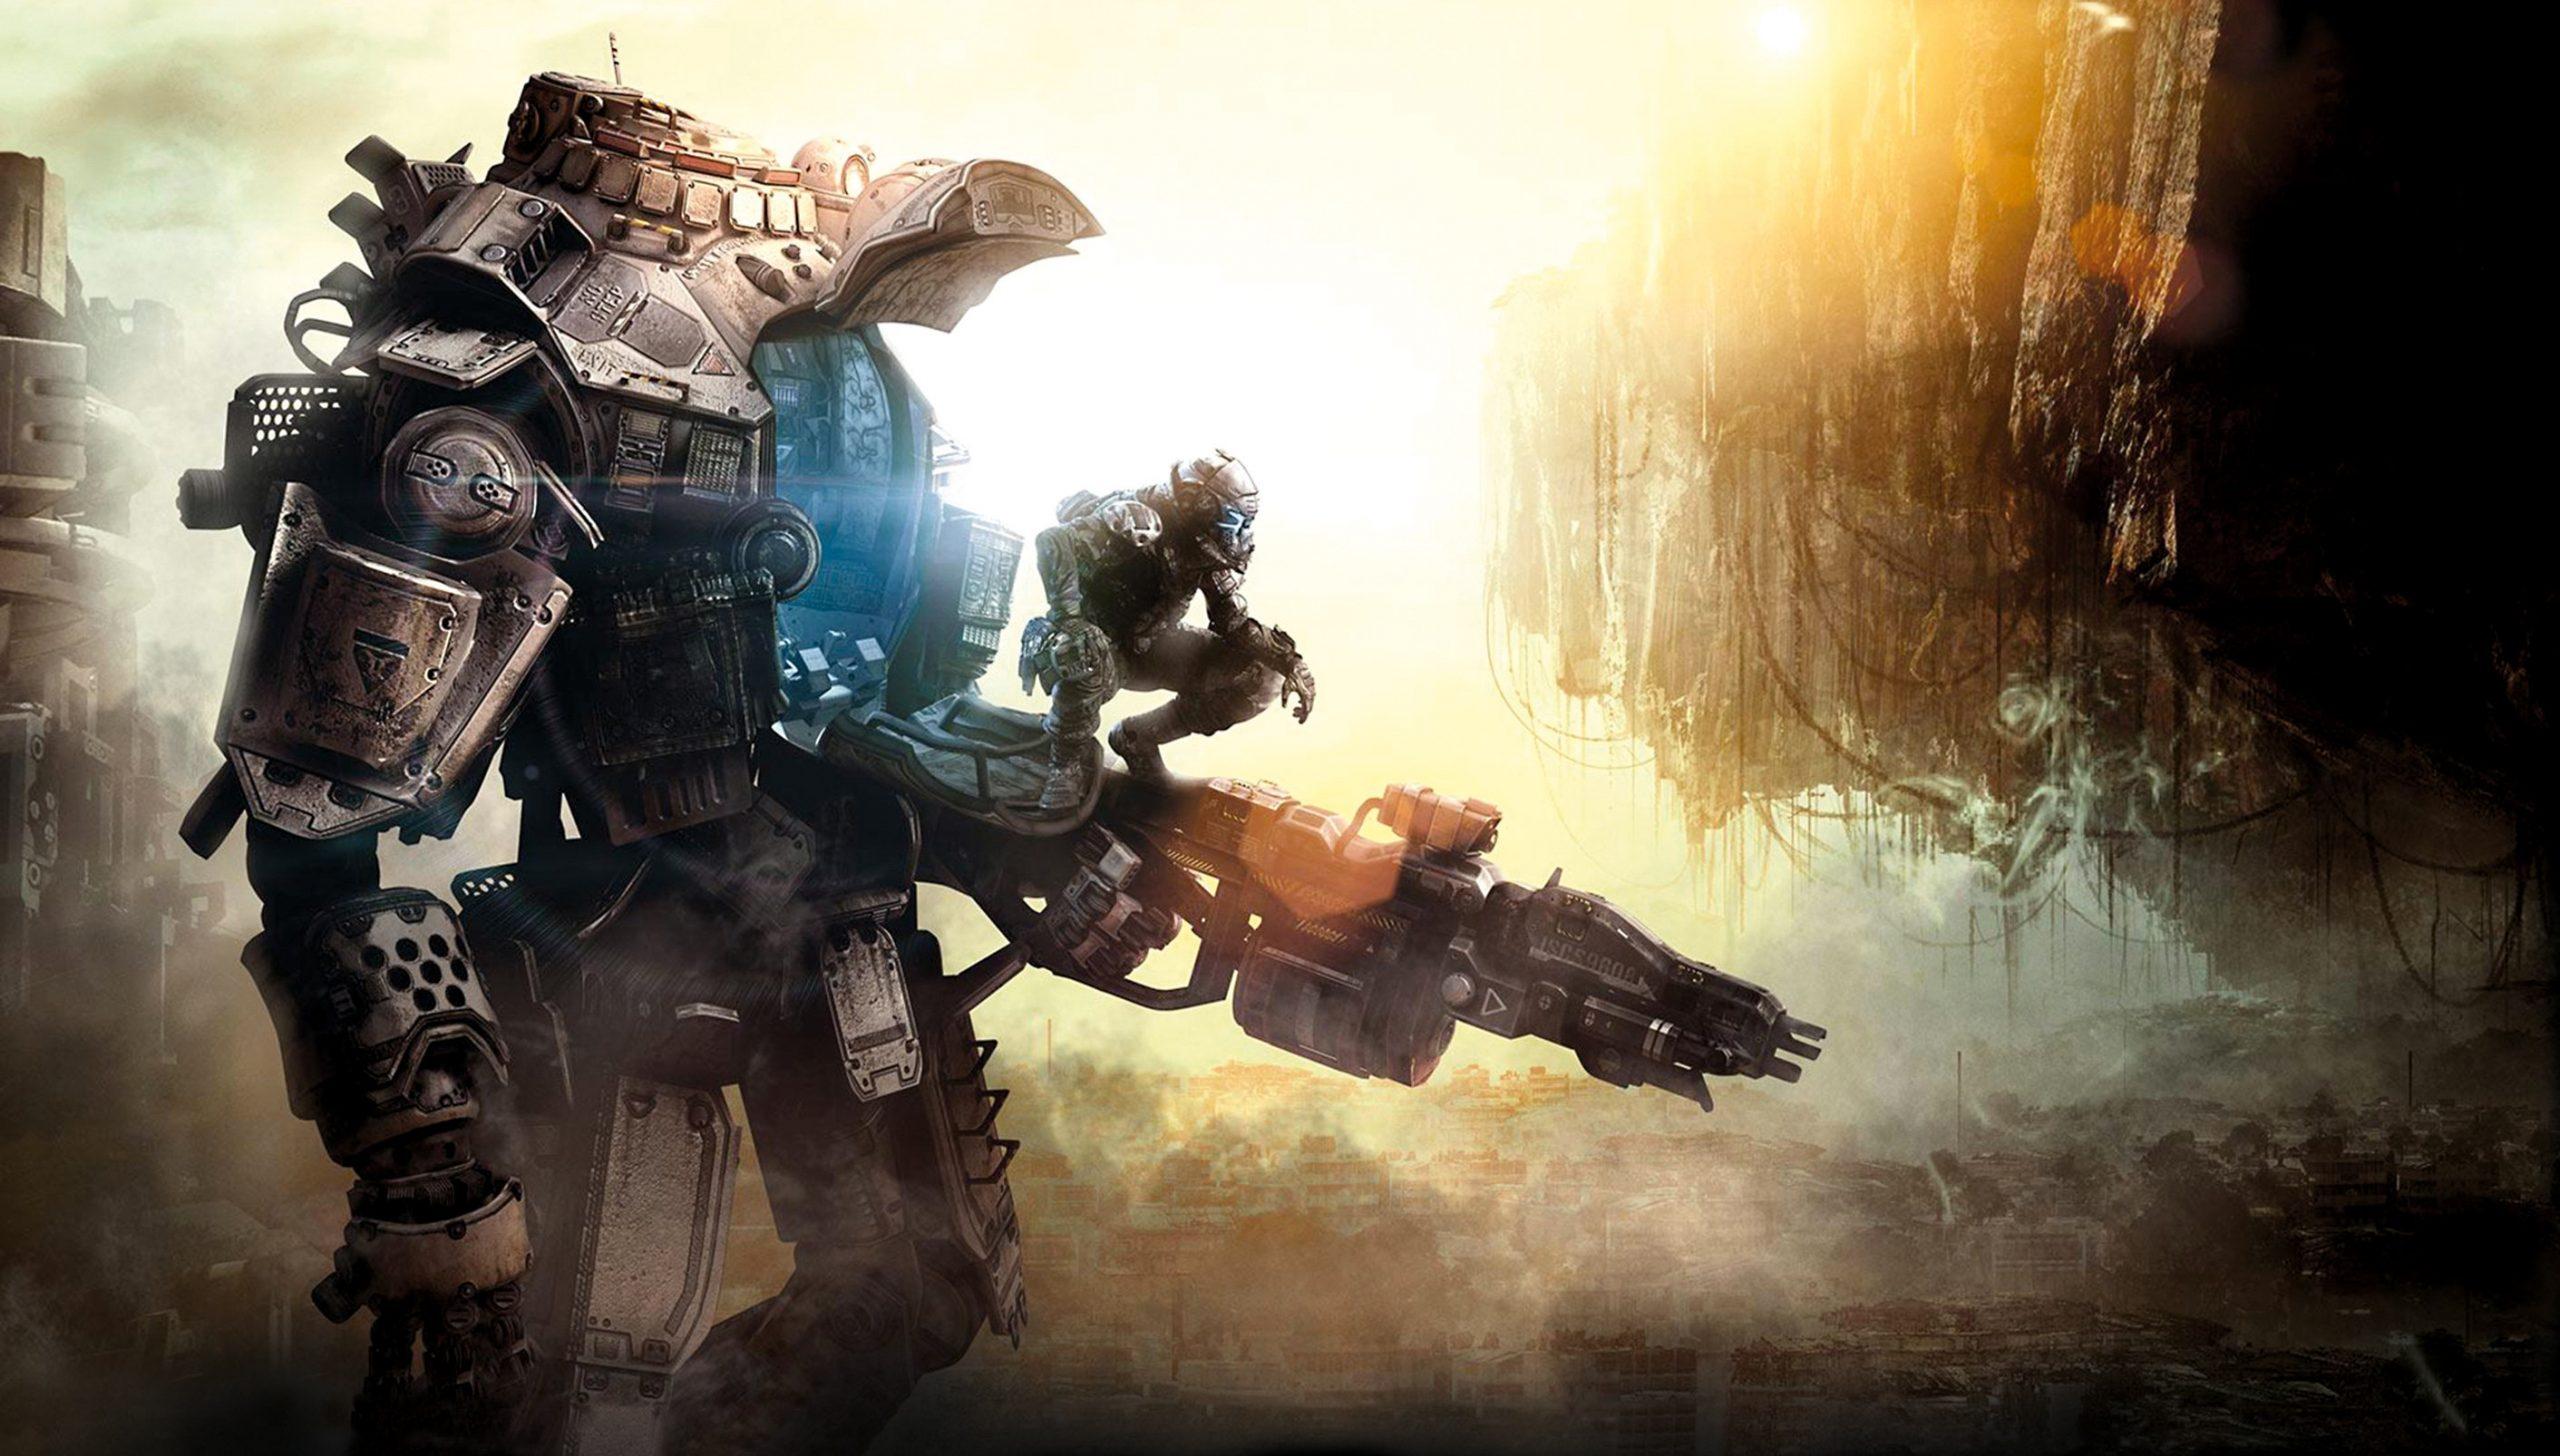 Titanfall. Паркур и гигантские боевые роботы